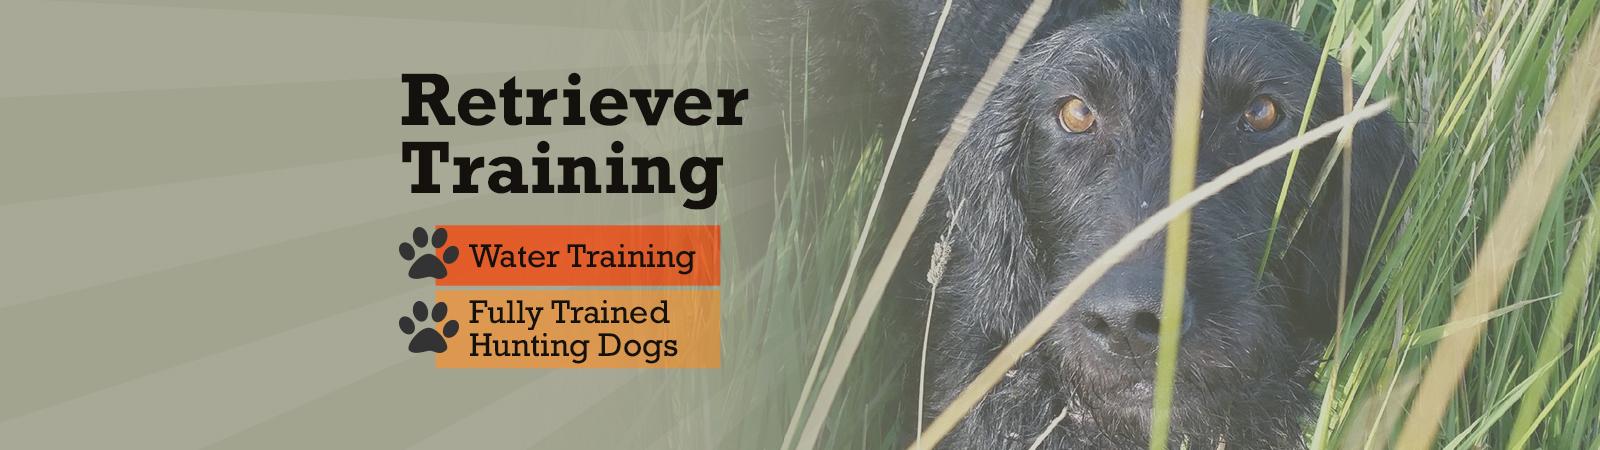 slider_retriever_training1